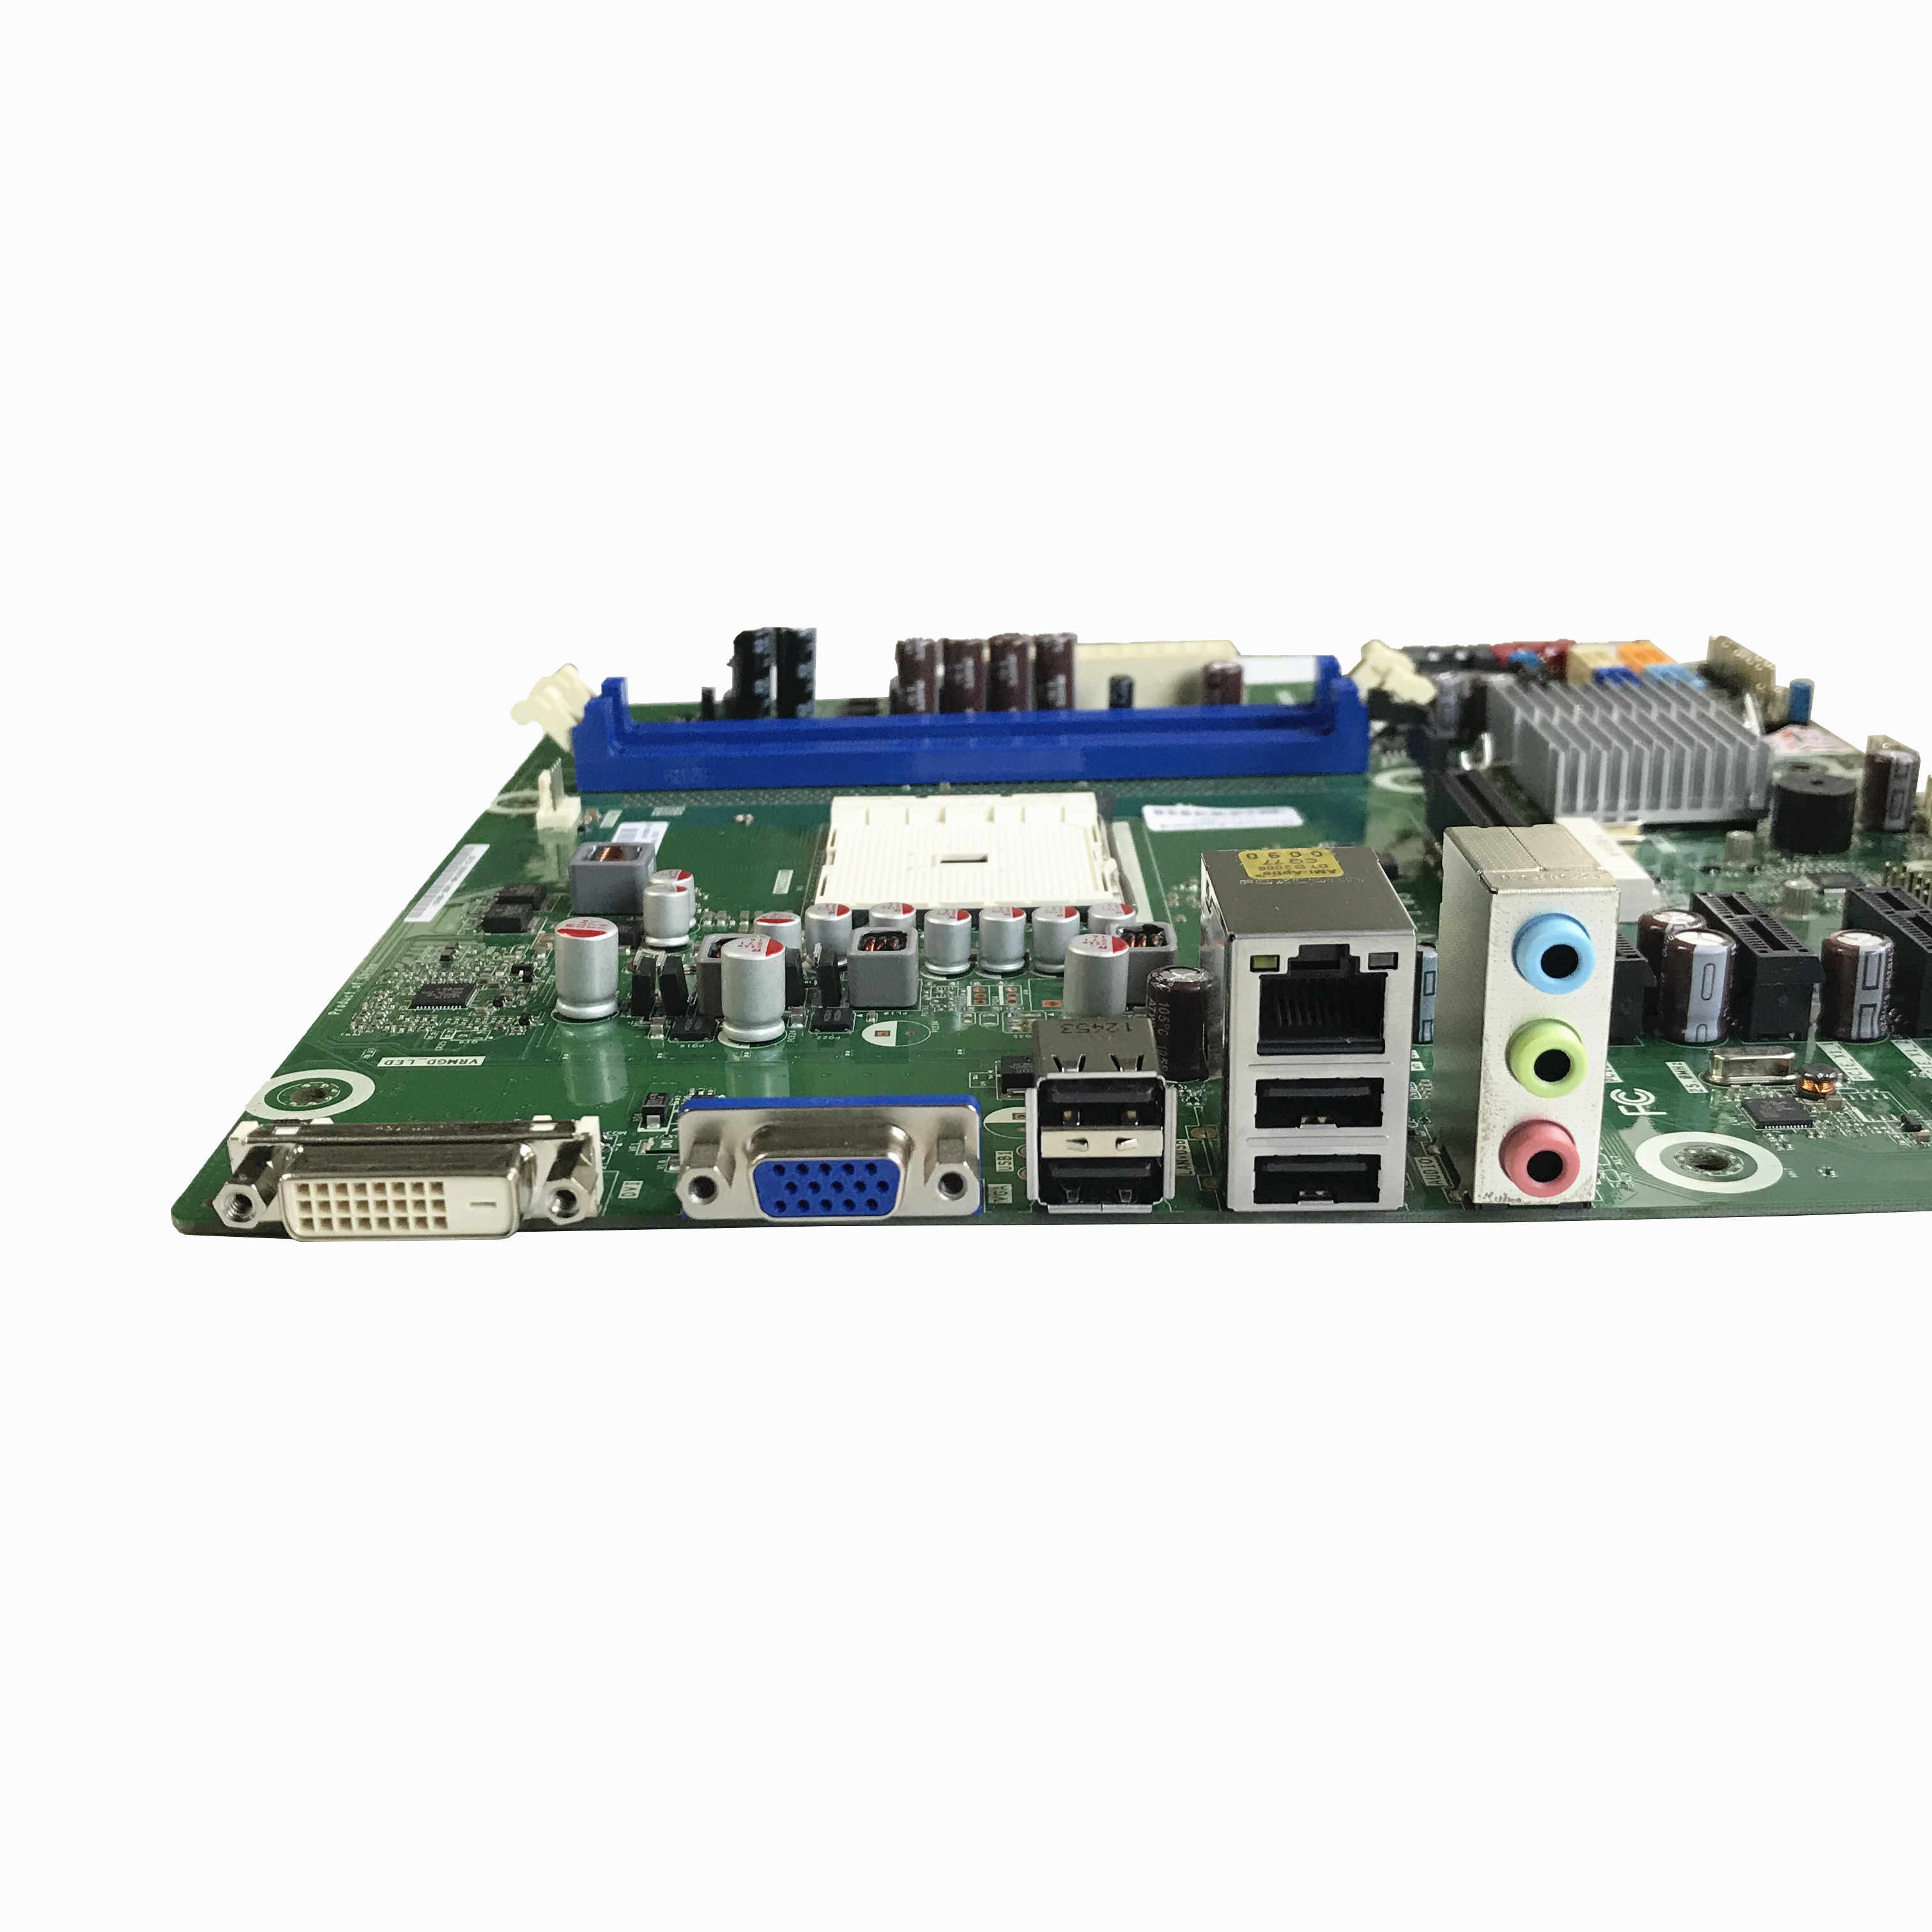 Hp FM1 A55 AAHD2-HY デスクトップマザーボード 701022-001 701022-501 701022-601 696350-001 メガバイト 100% テスト高速船